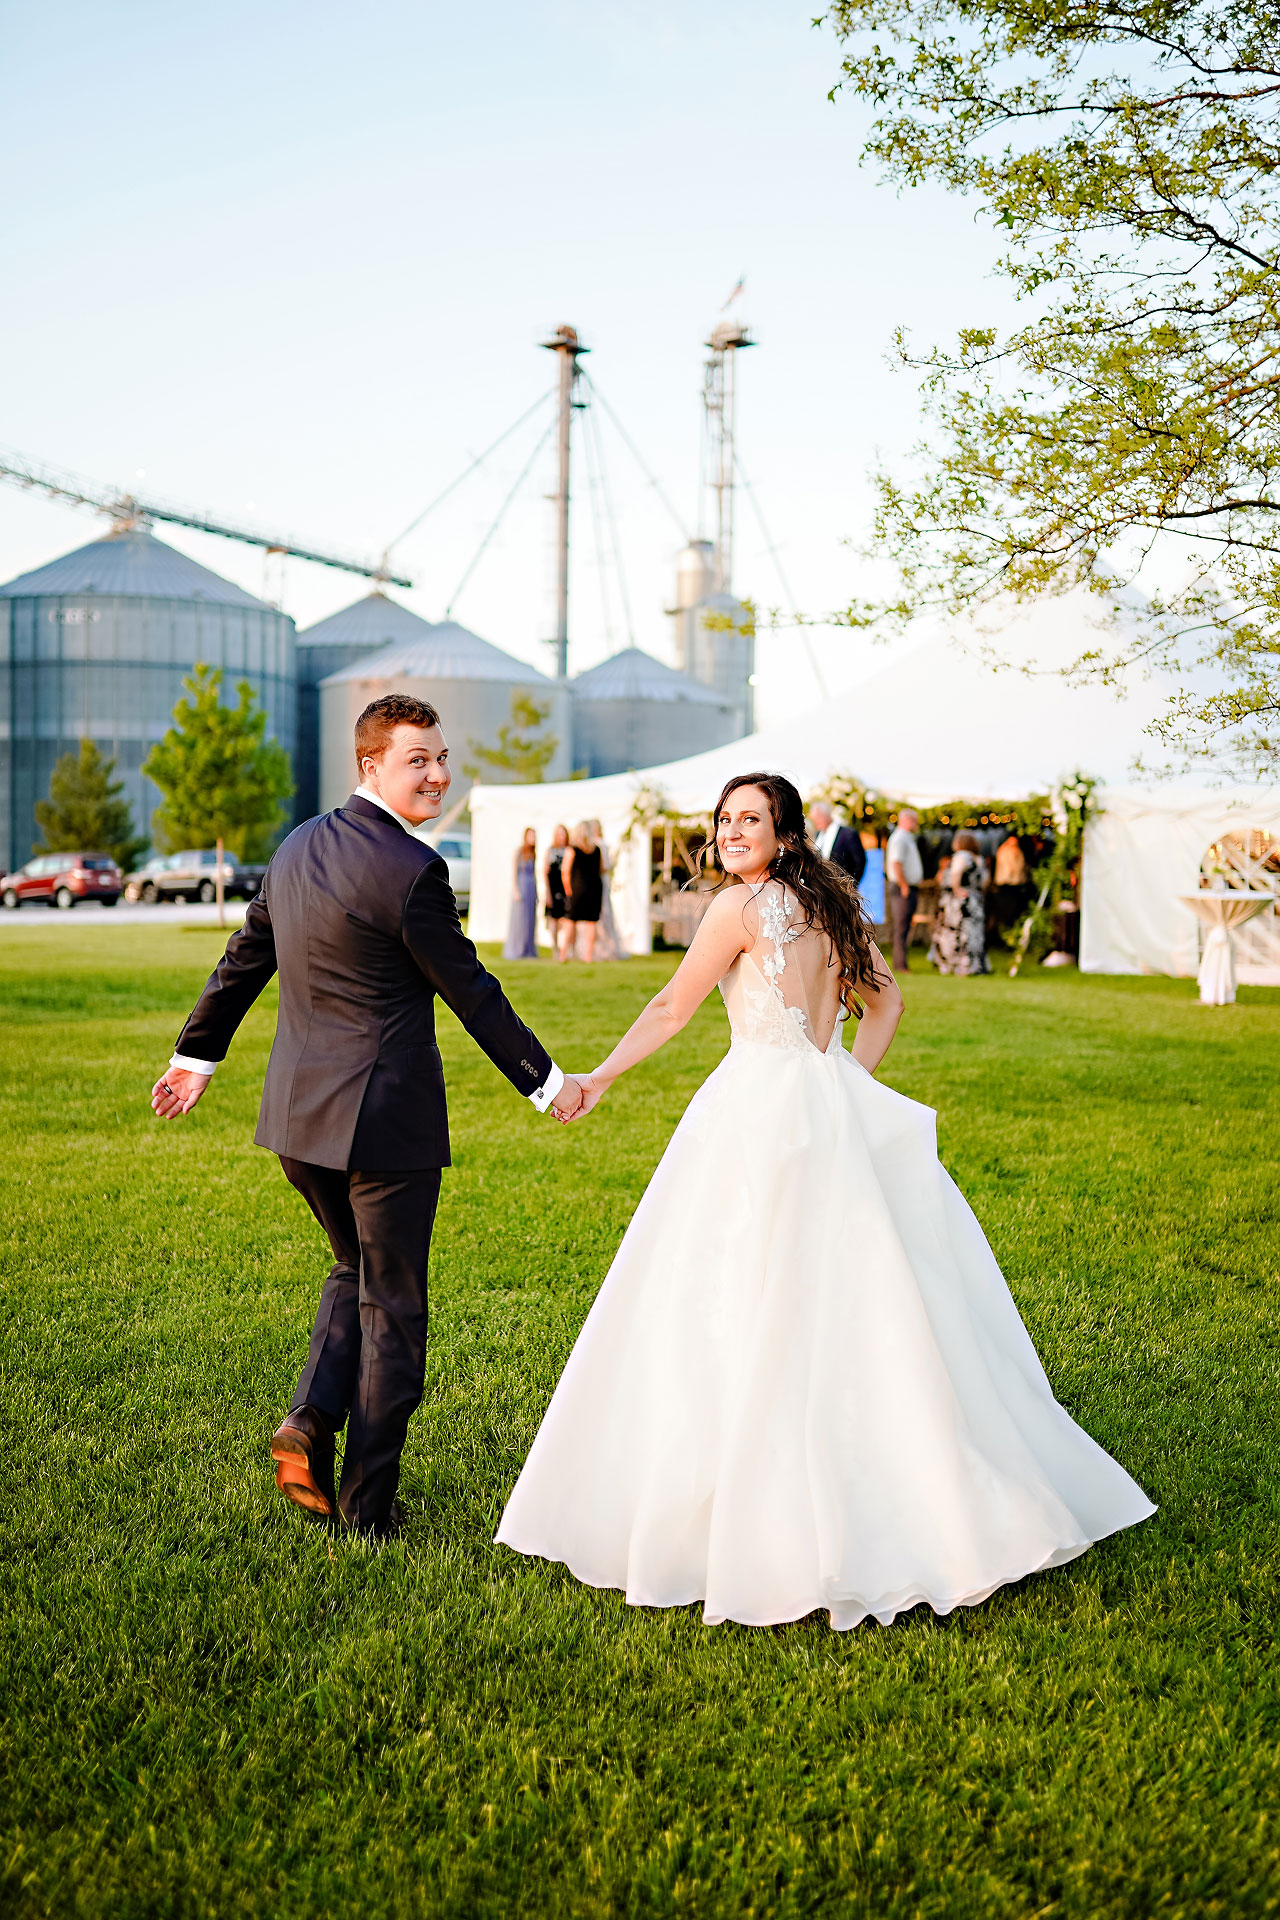 MacKinze John Lafayette Indiana Purdue Wedding 264